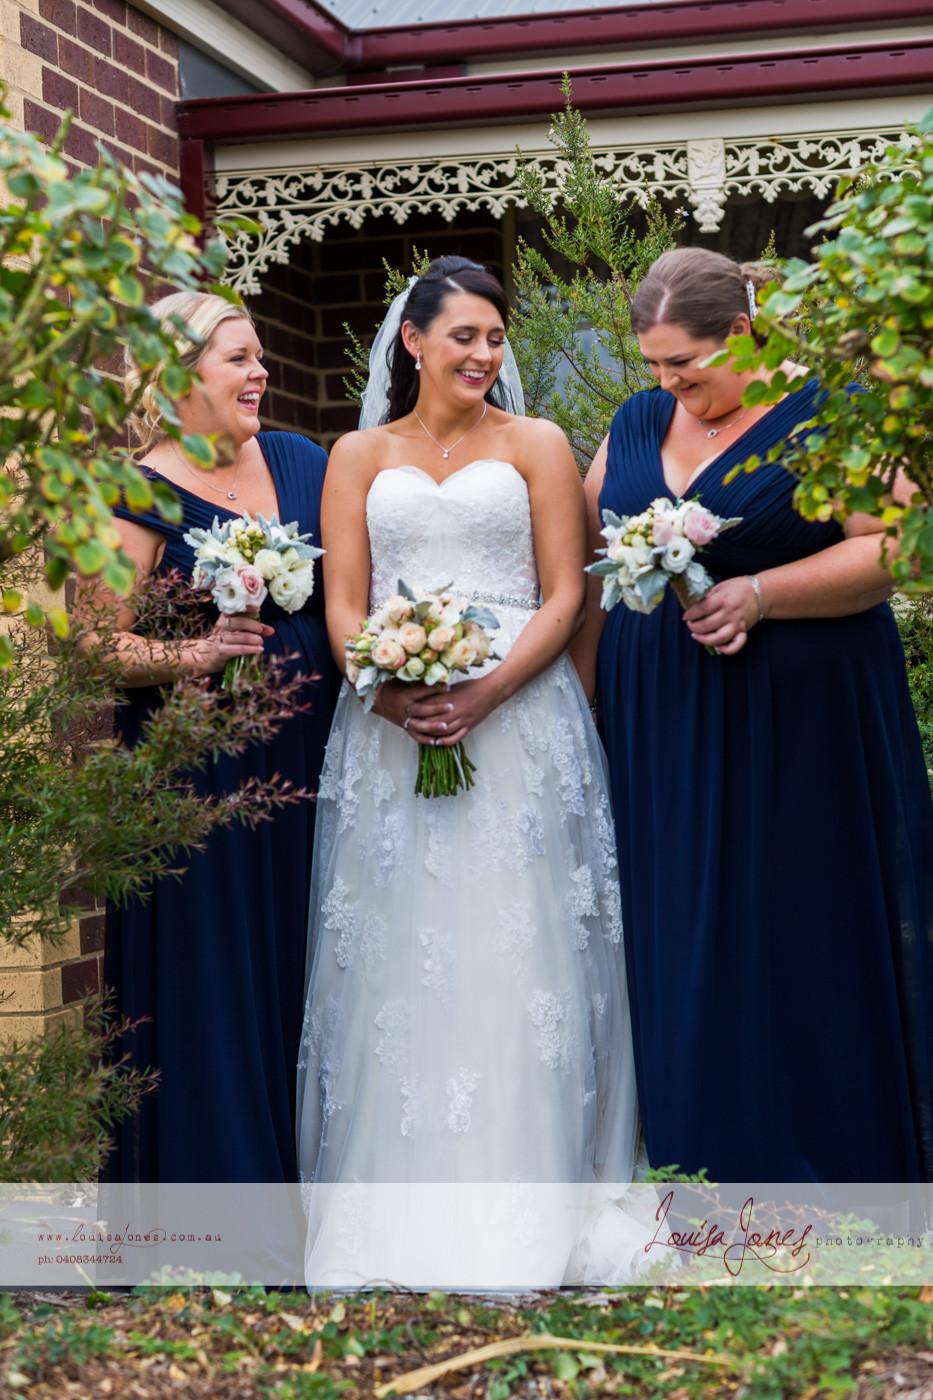 Geelong Surf Coast Wedding Photographer 039.jpg